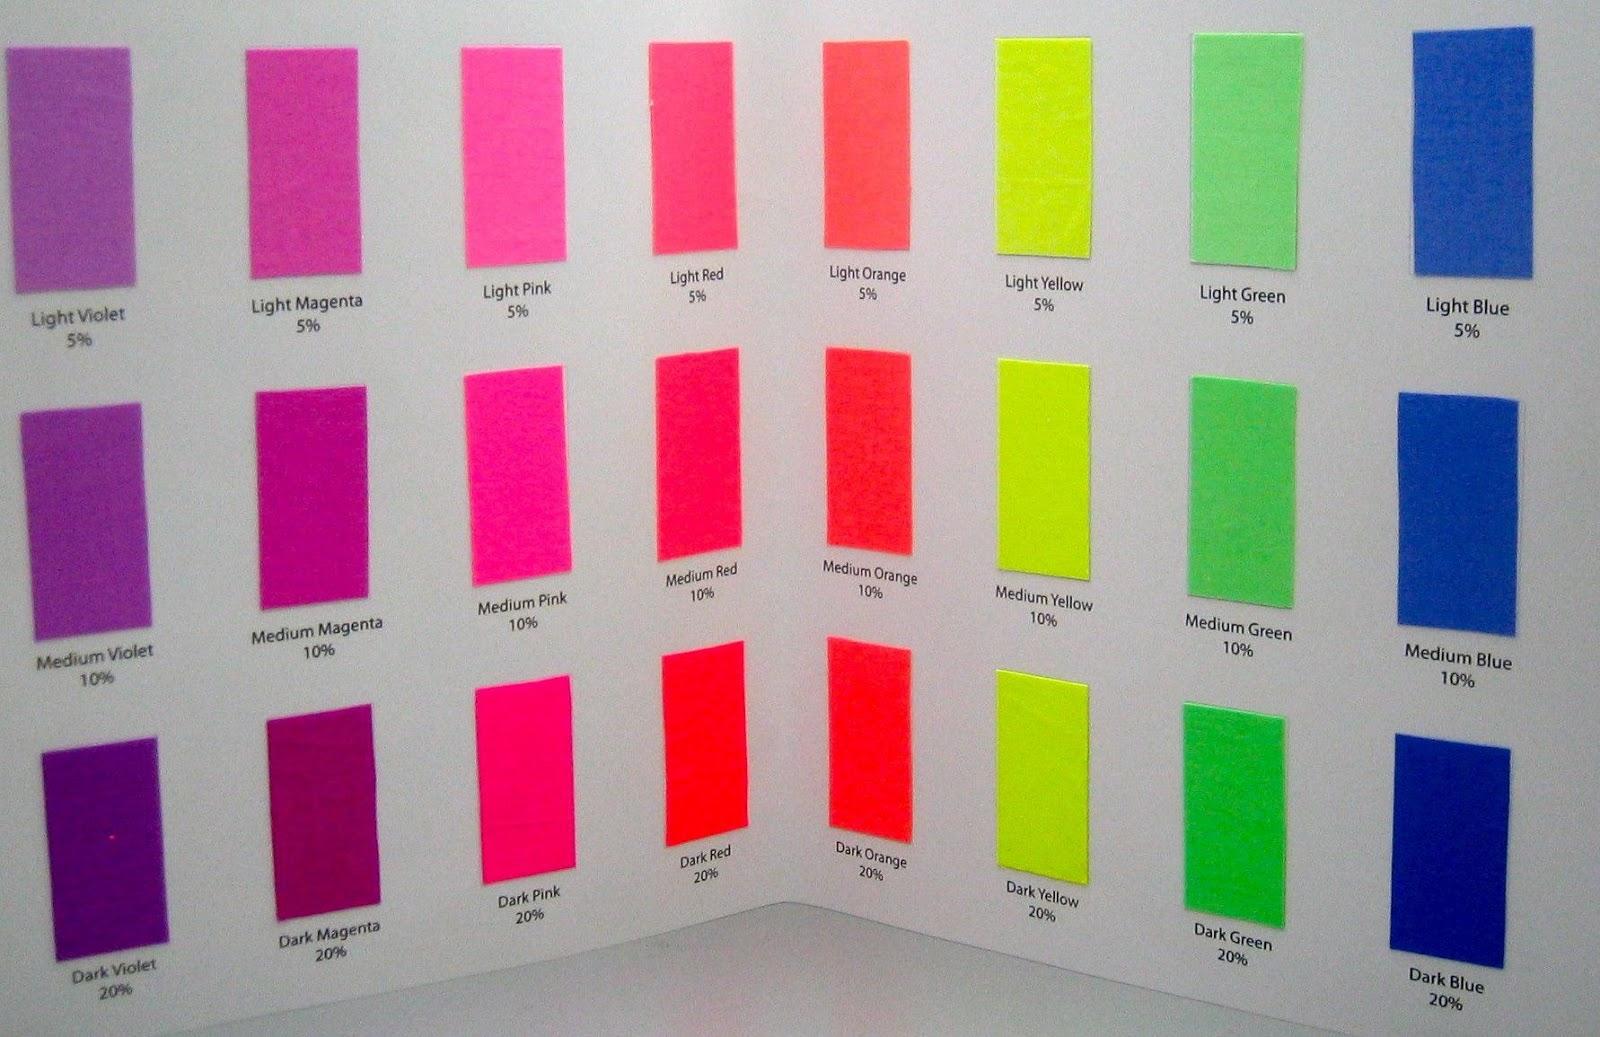 lookbookyou are neon colors still trending